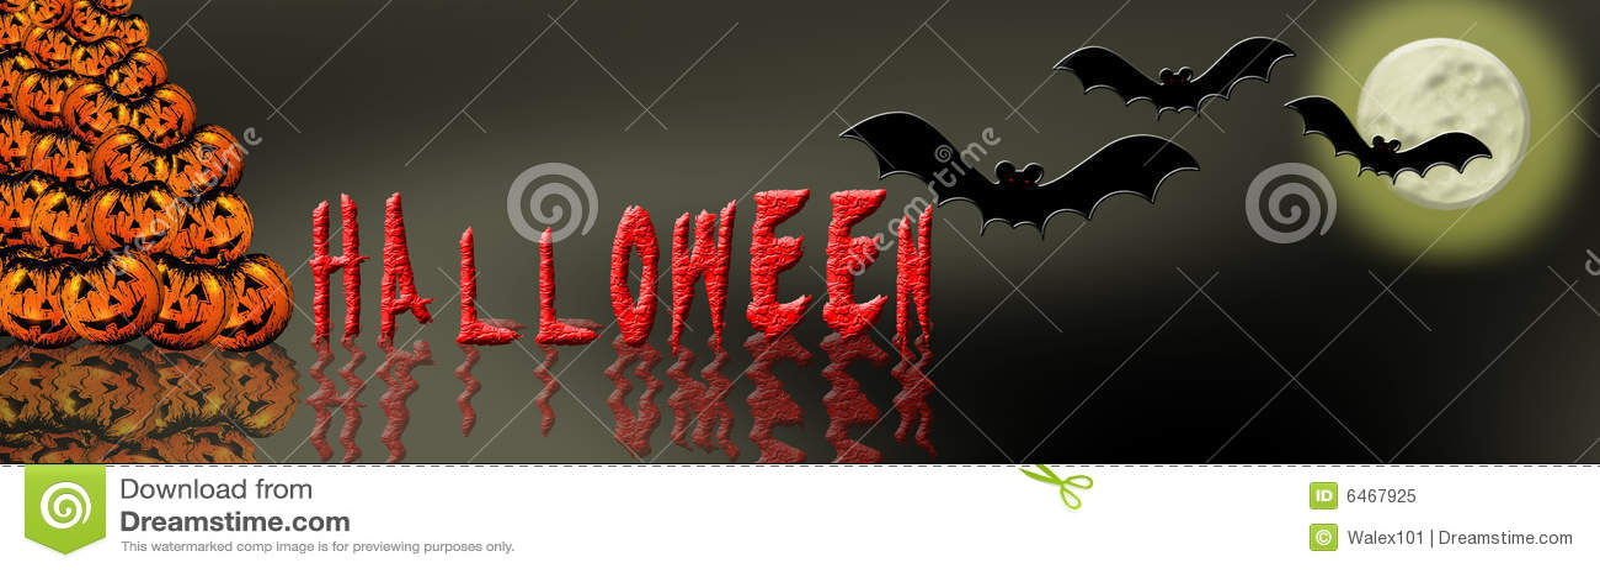 7 banner Halloween.